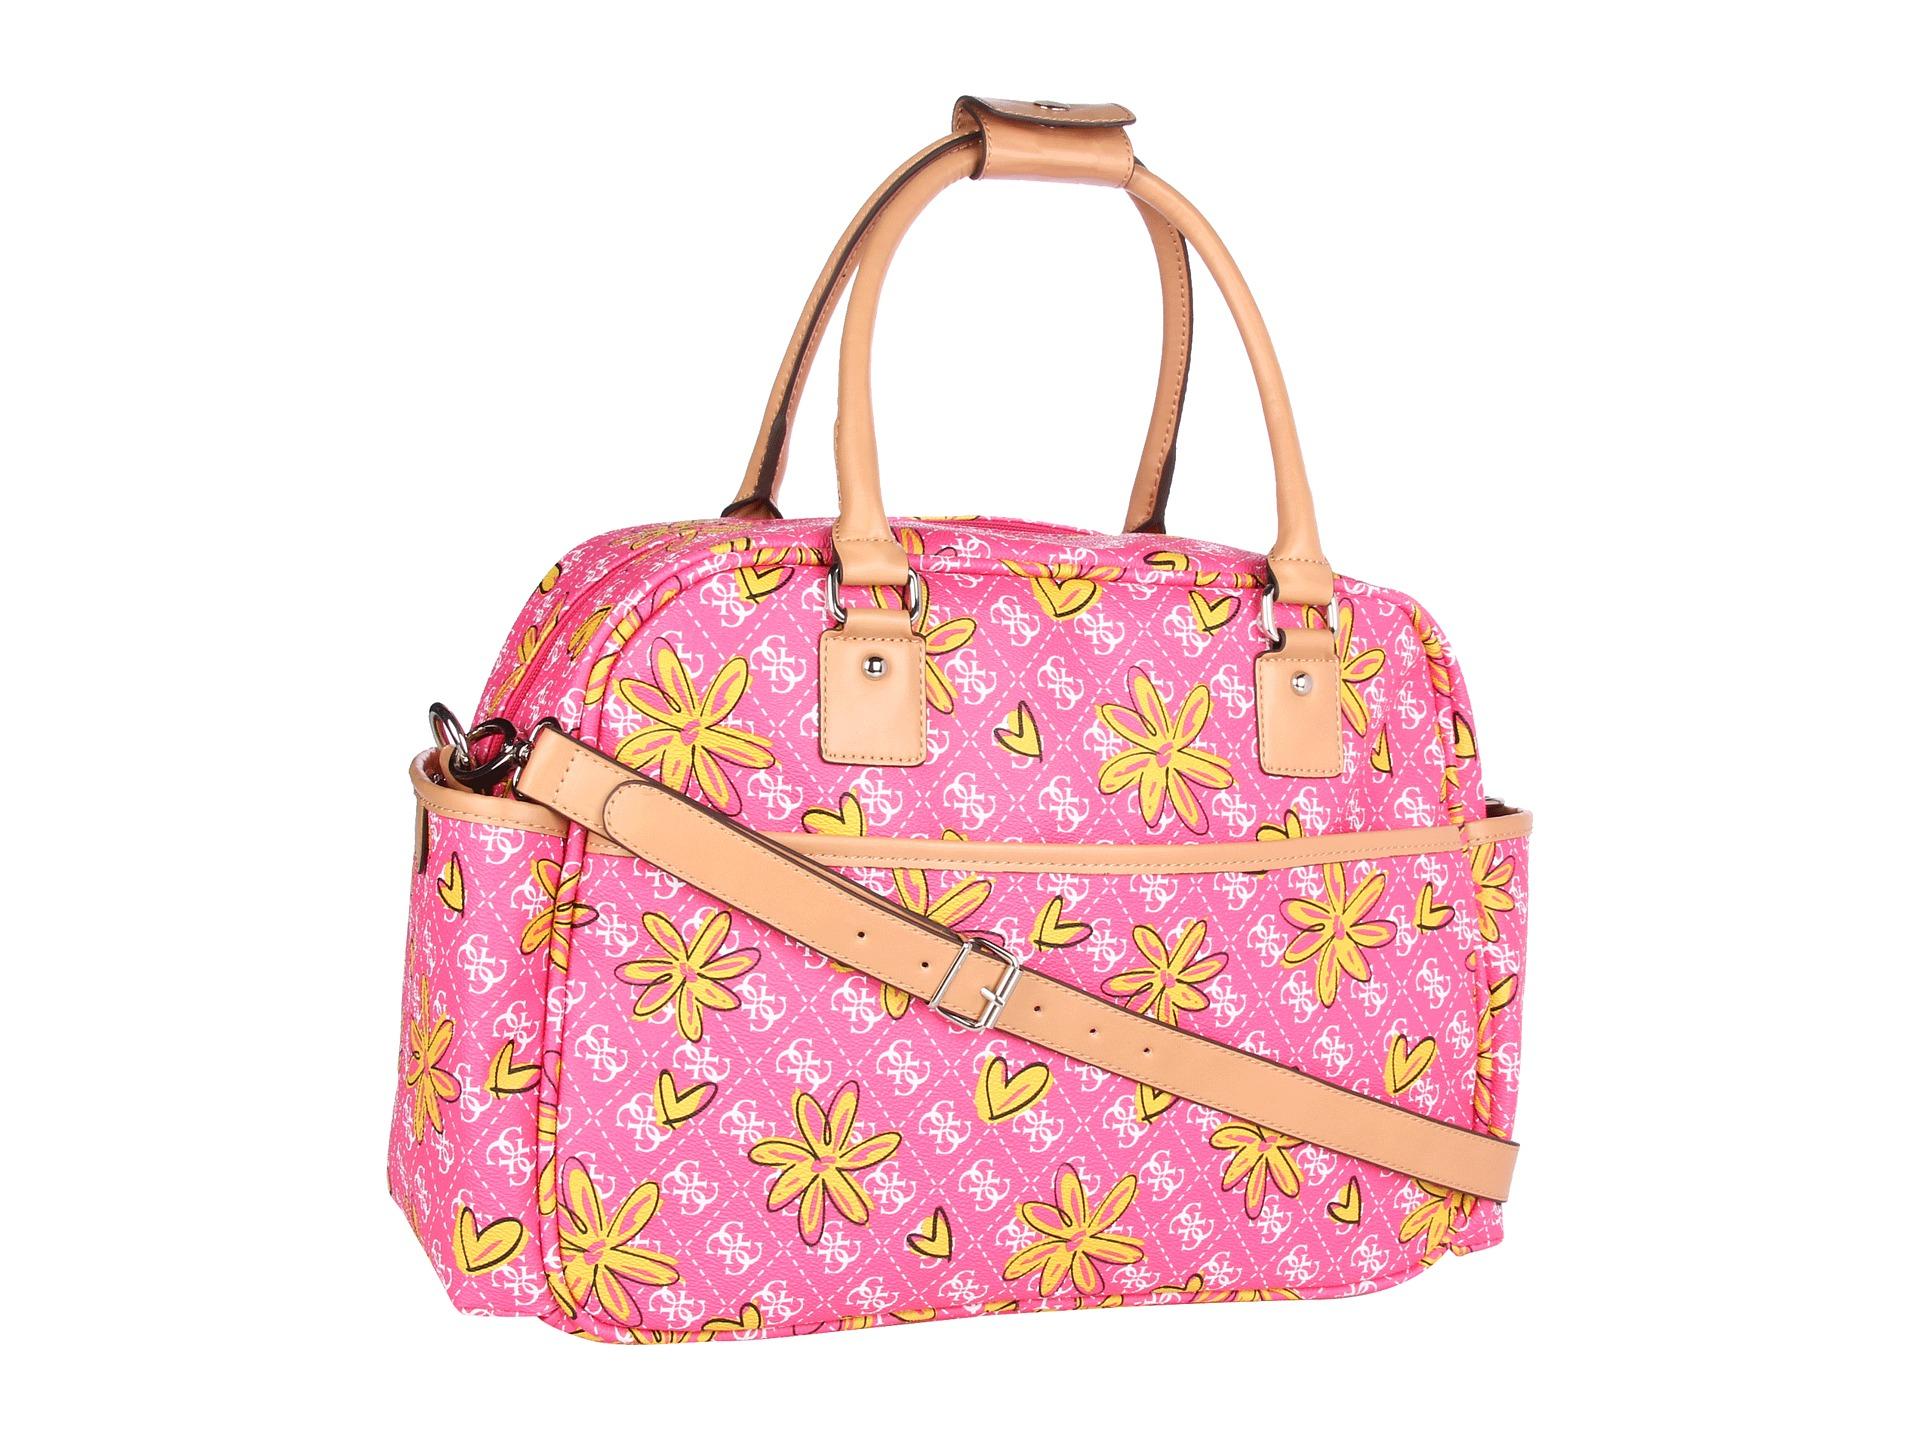 Guess Diaper Bags - Bag Photos and Wallpaper HD e5823b7238648